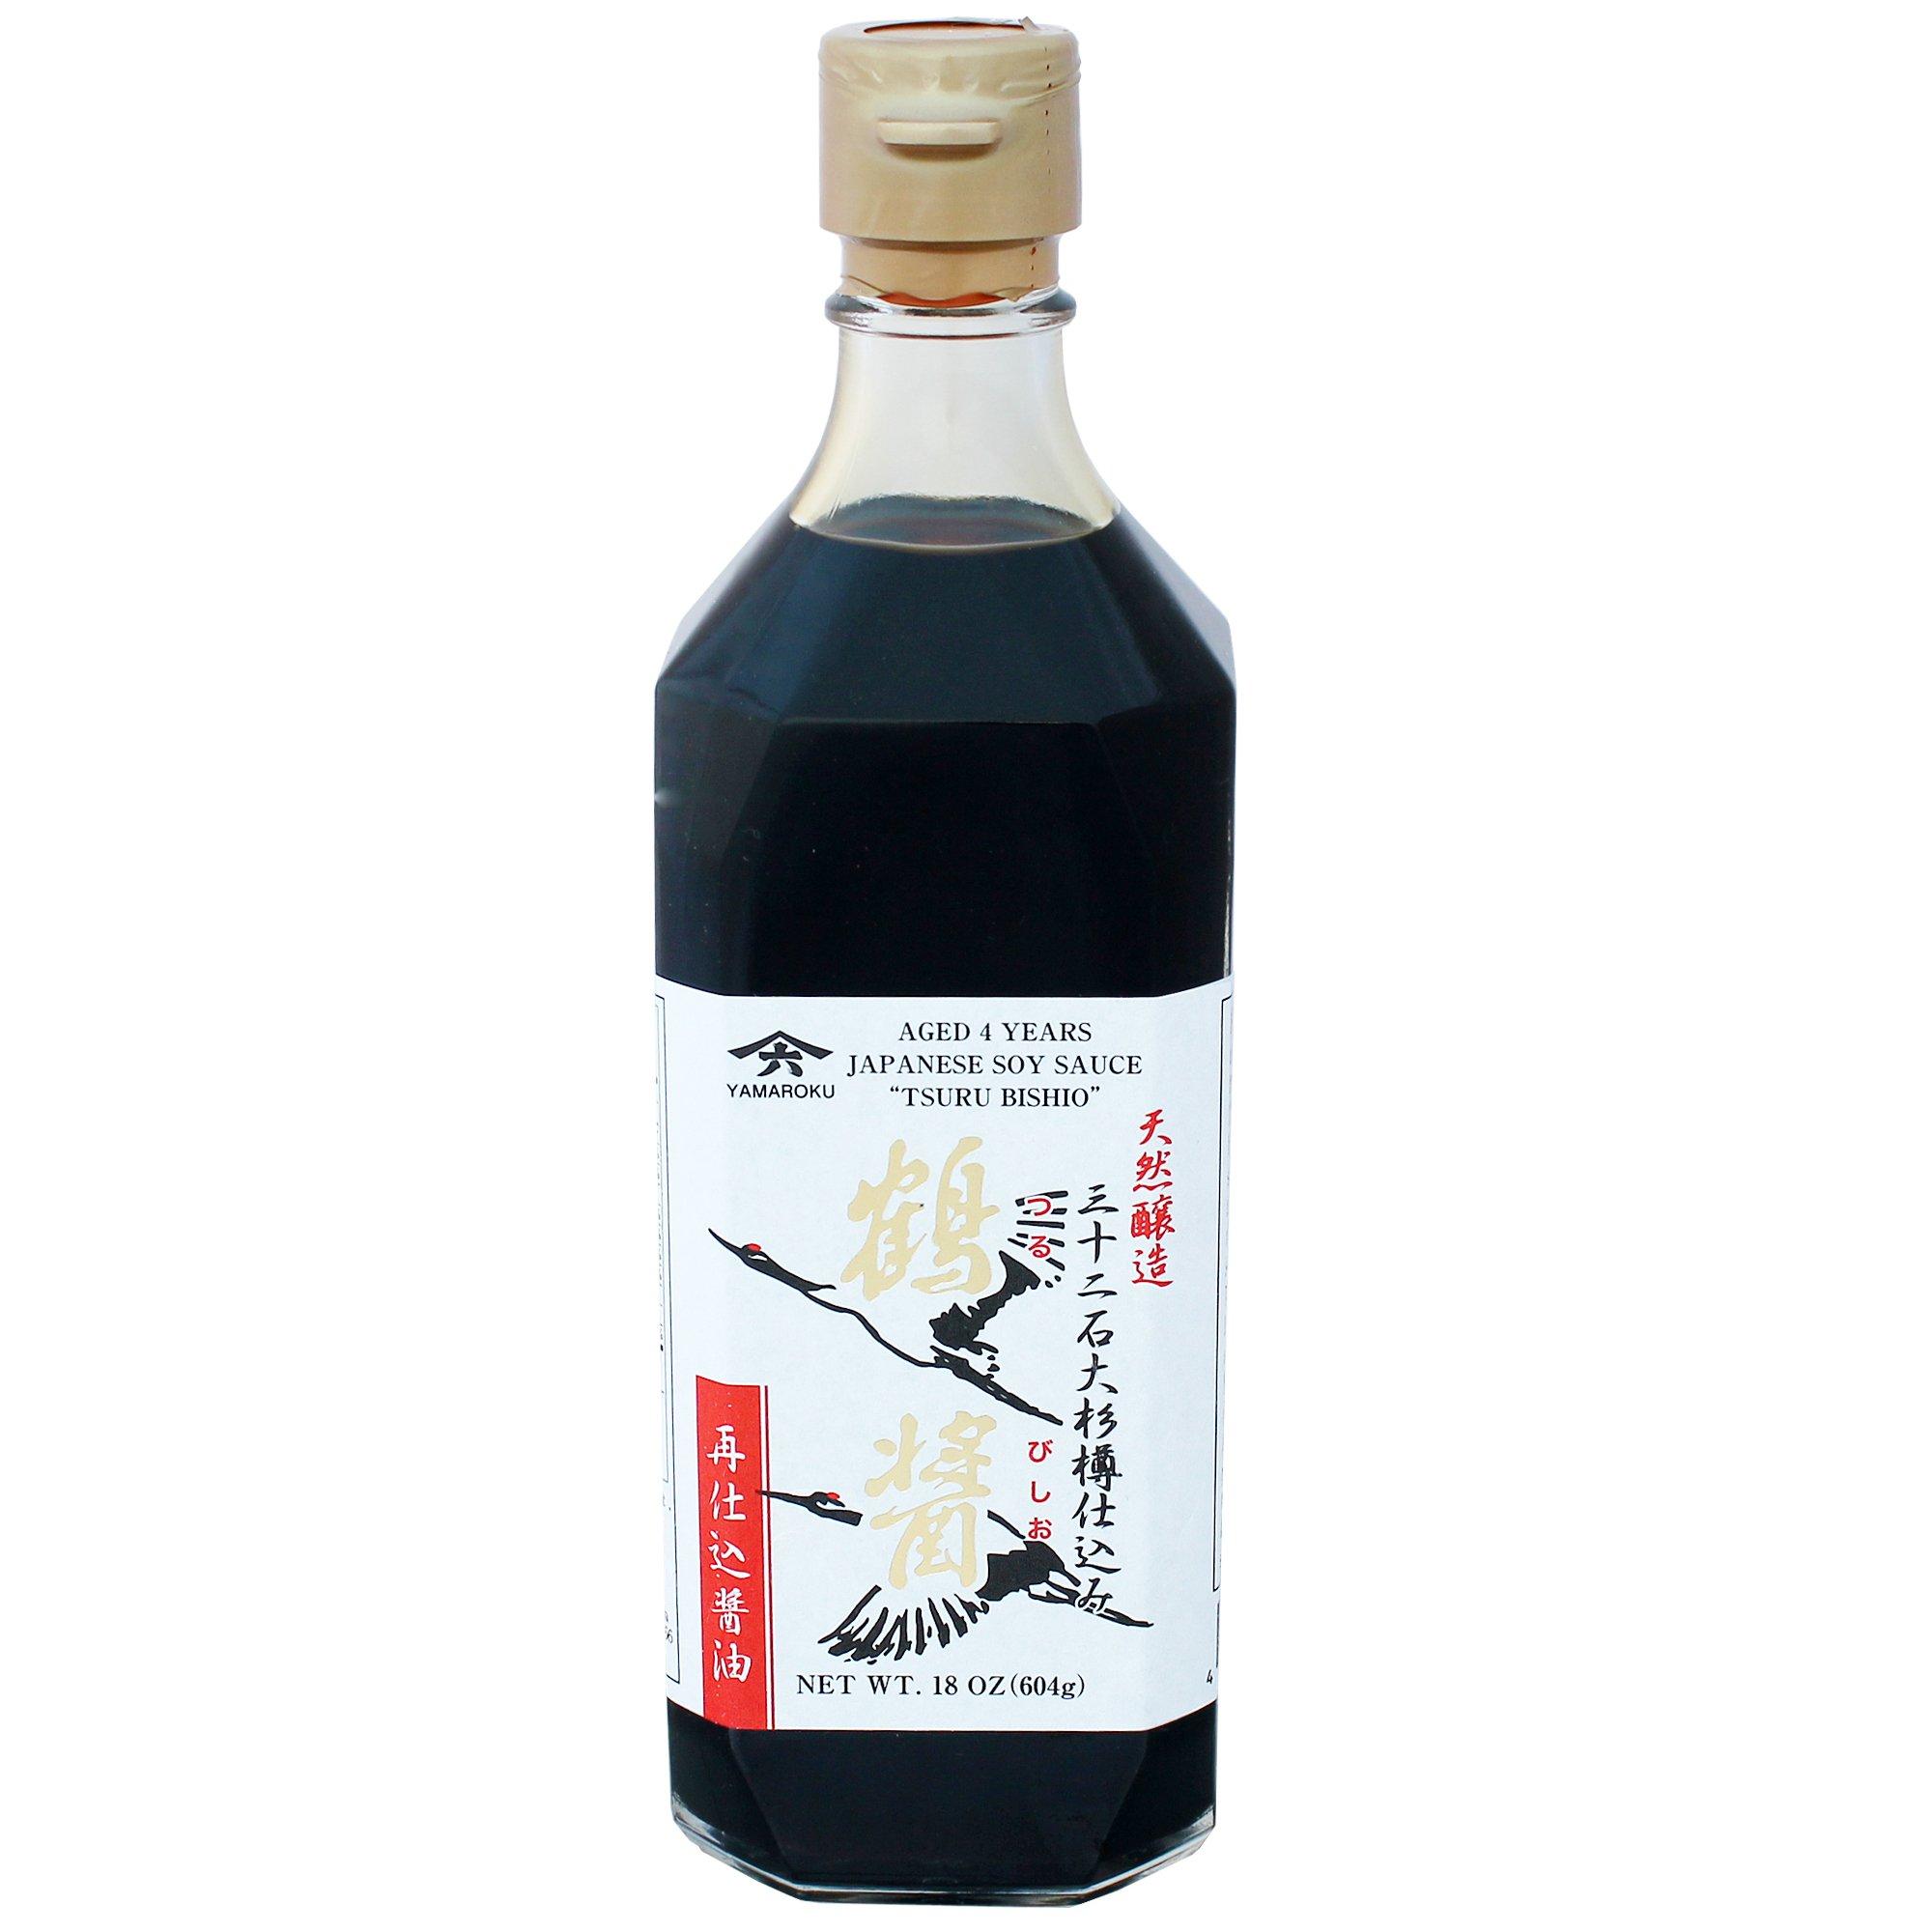 Japanese Yamaroku Aged 4 Years Soy Sauce''Tsuru Bisiho'', 18oz (532ml), Pack of 2 by Yamaroku